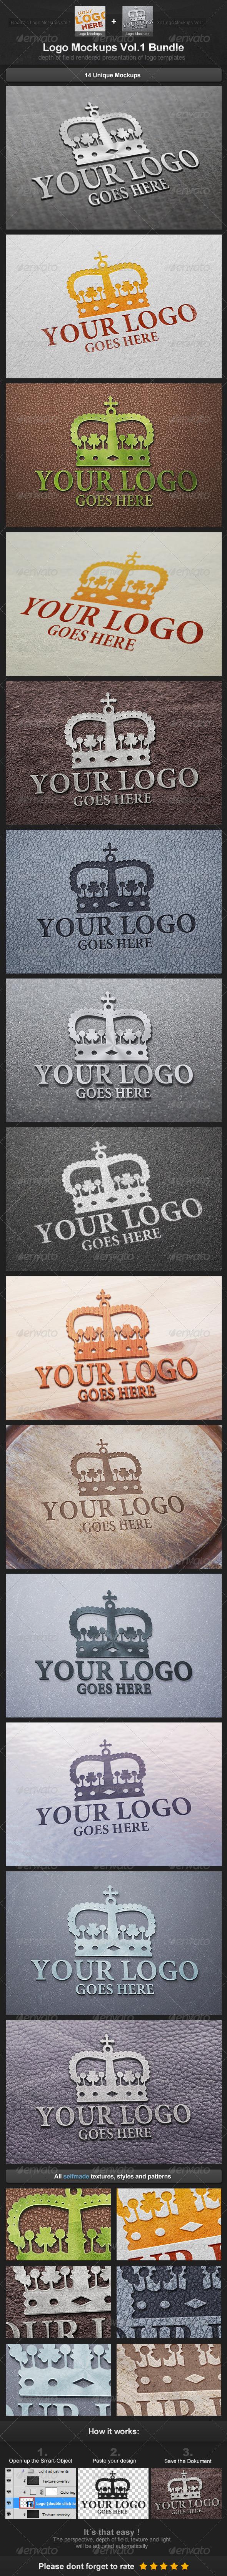 GraphicRiver Logo Mockups Vol.1 Bundle 3501397